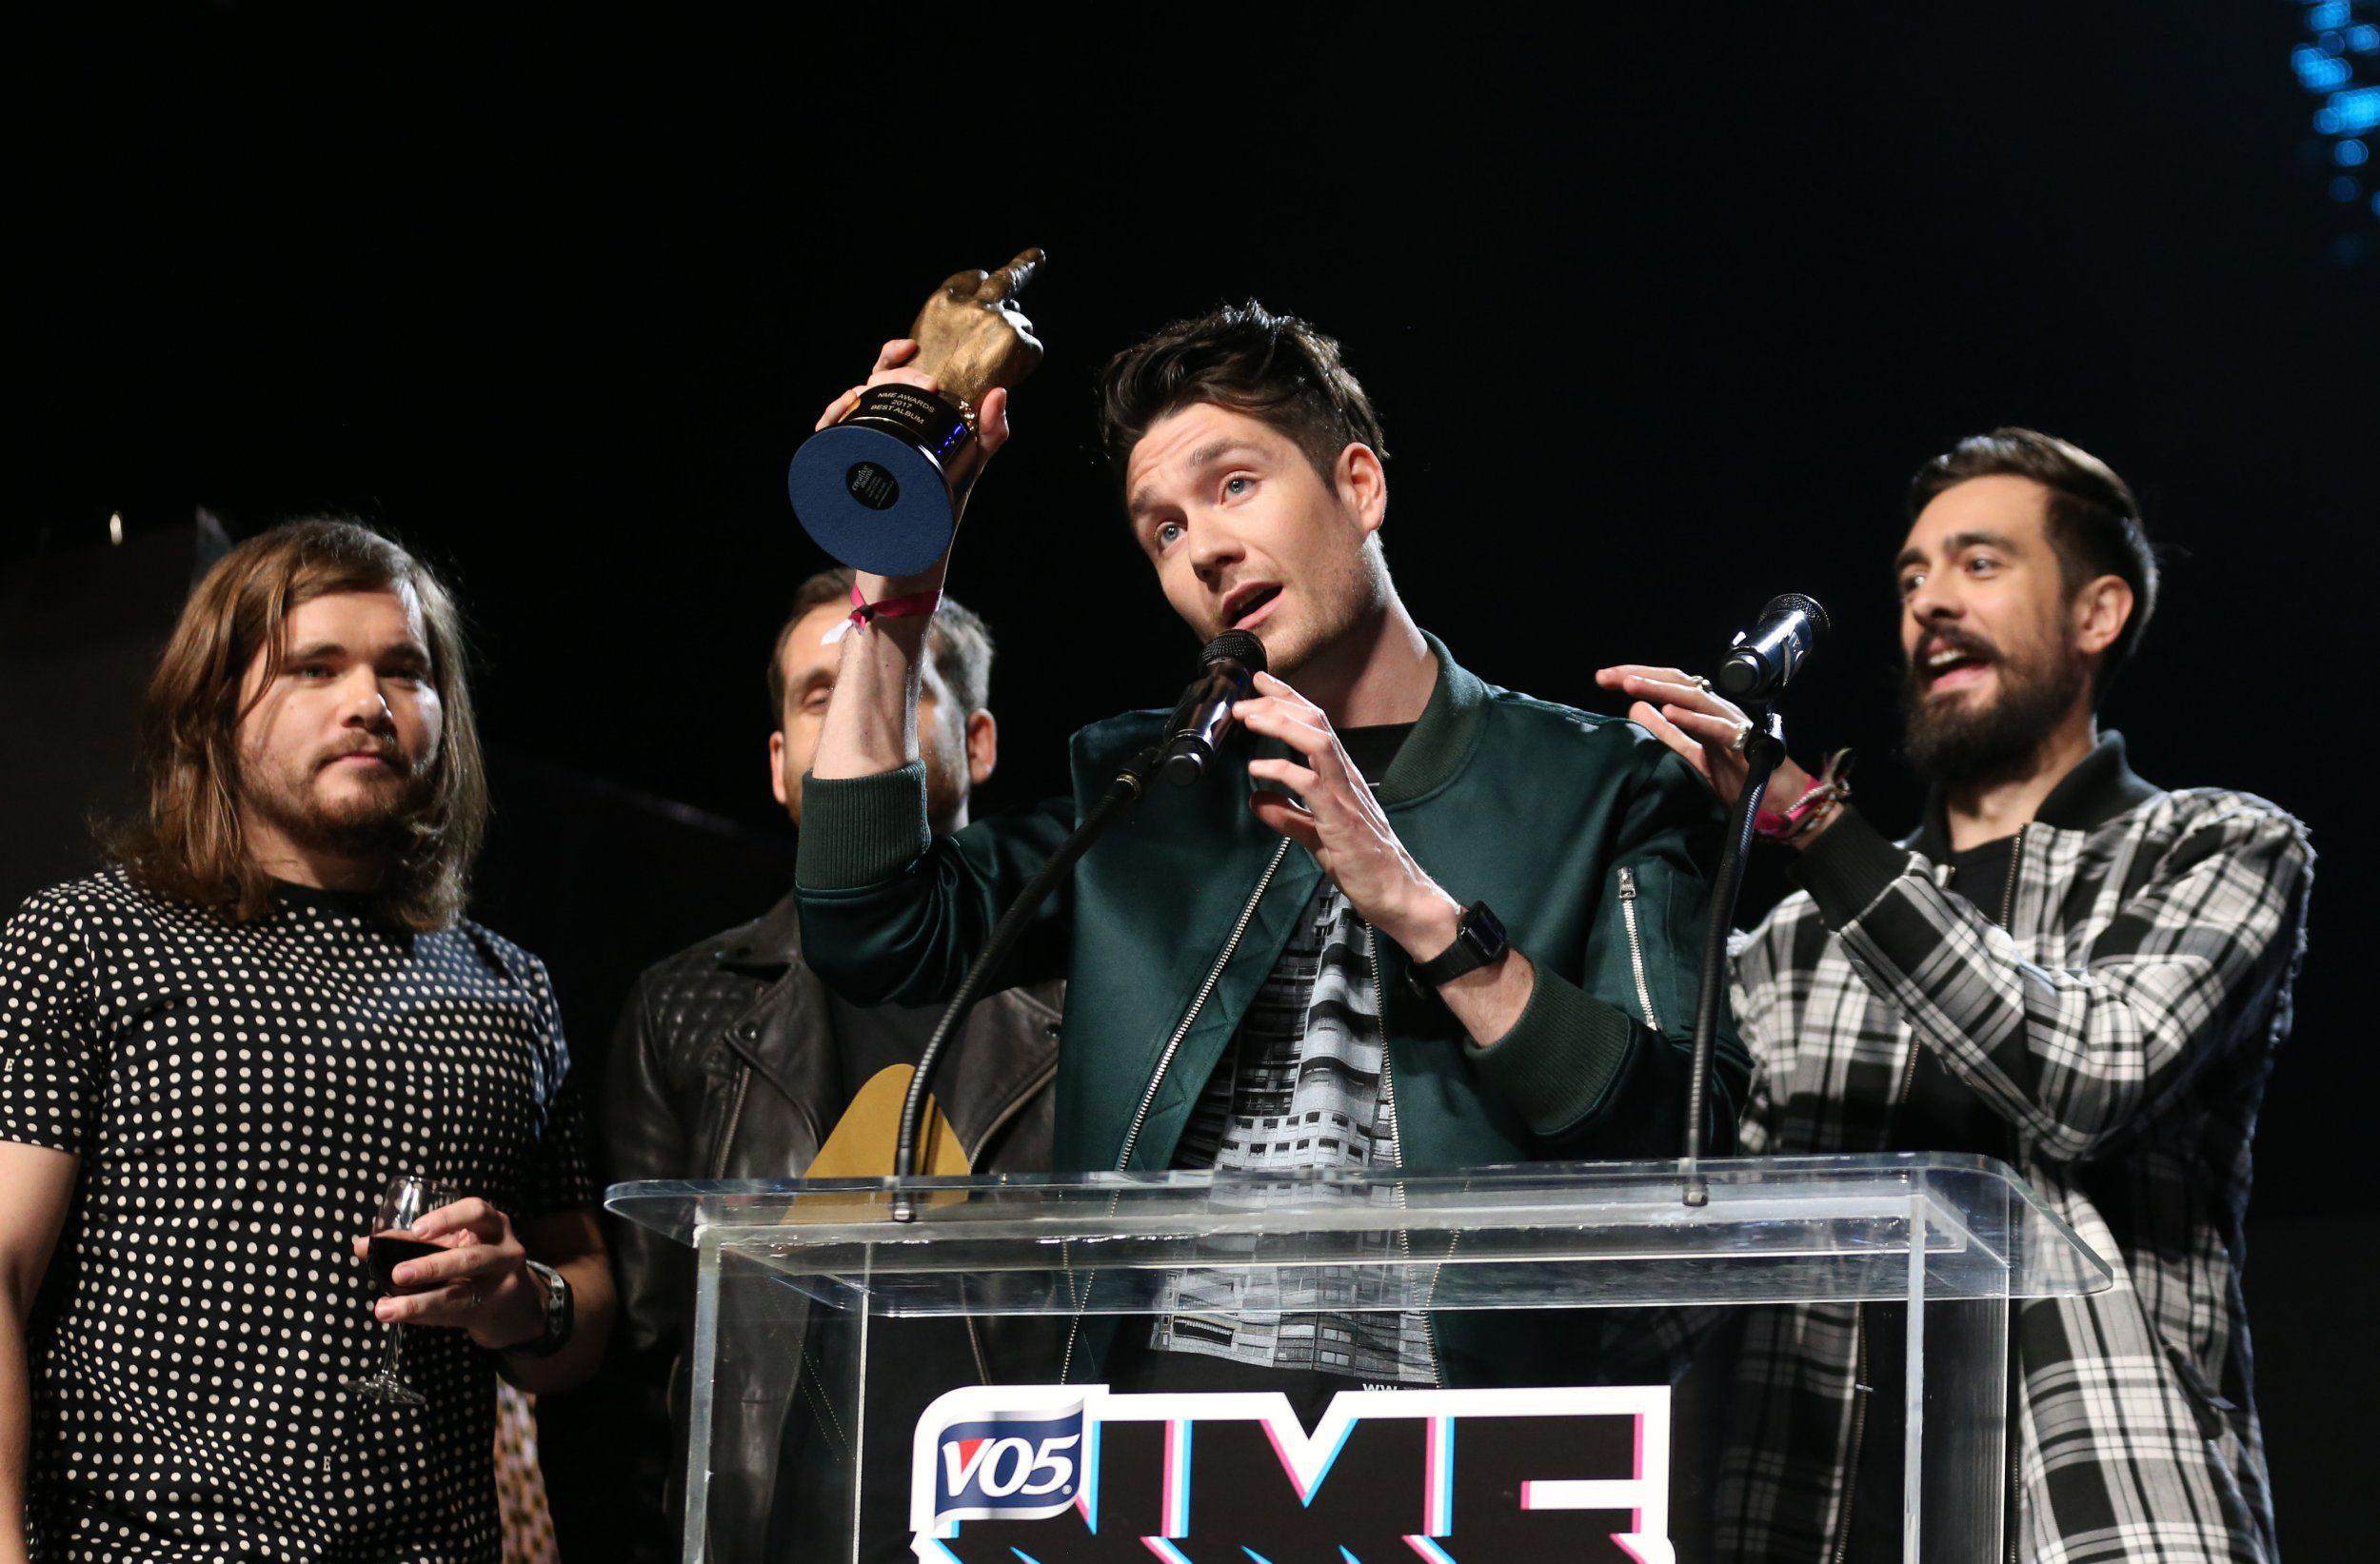 Mandatory Credit: Photo by James Gourley/REX/Shutterstock (8384993cd) Bastille - Winner of Best Album VO5 NME Awards, Show, London, UK - 15 Feb 2017